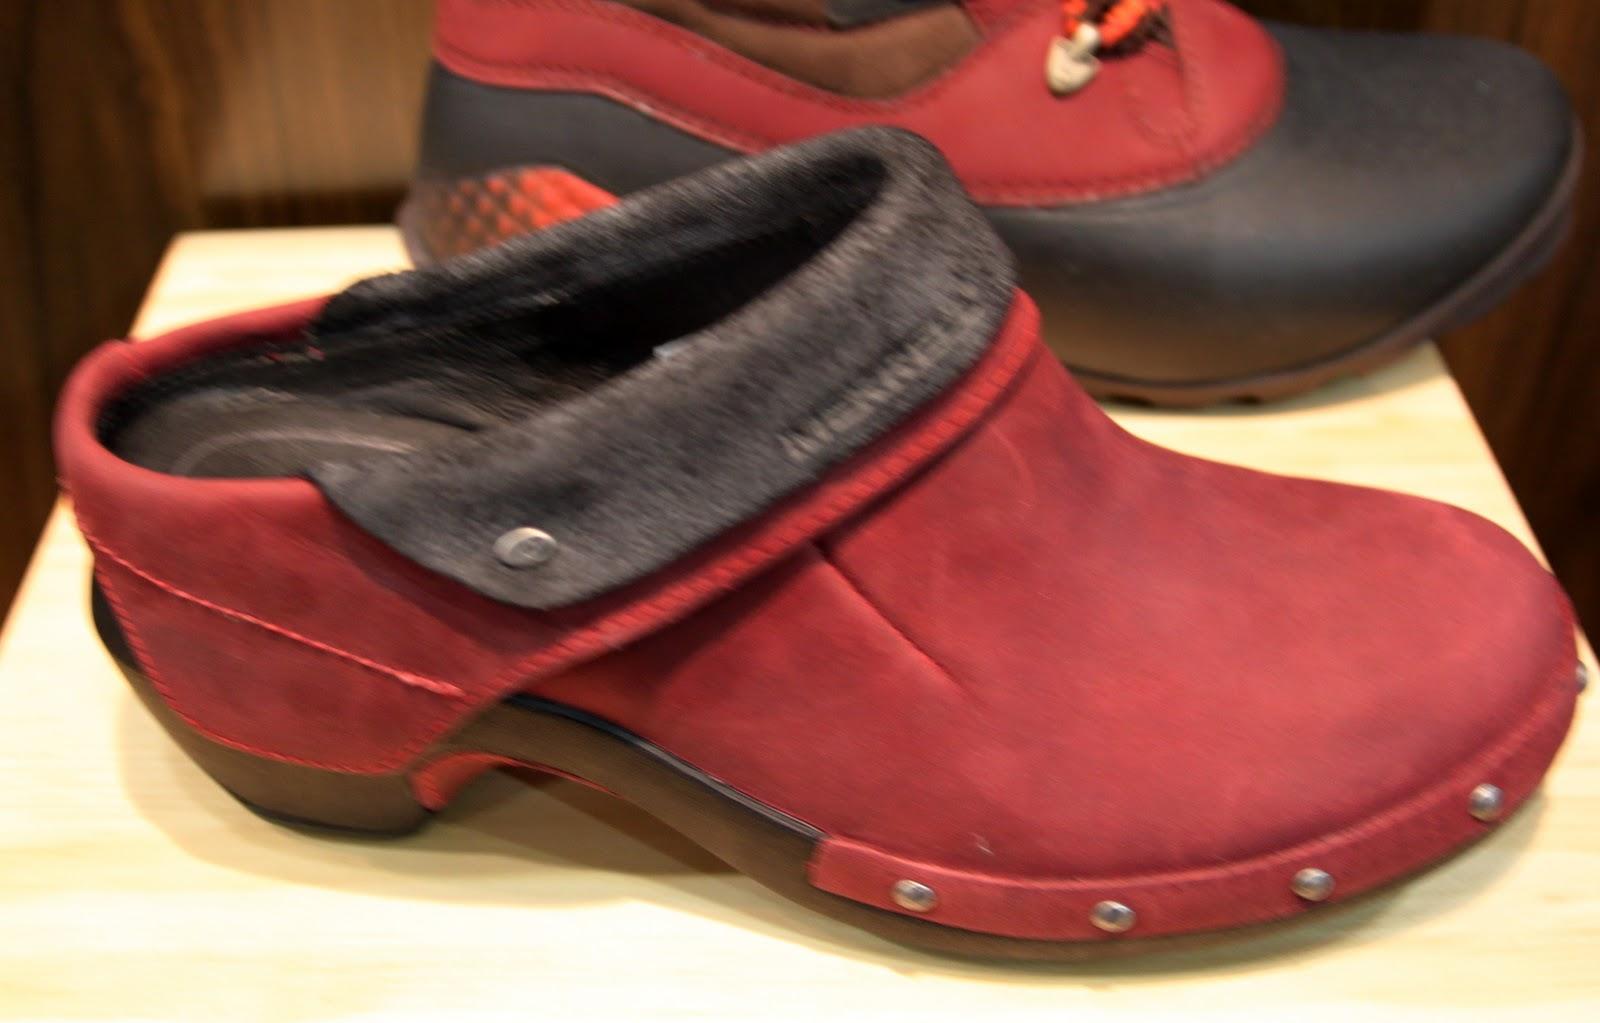 ab8c8bdef0a MERRELL BAREFOOT/VIBRAM®, FOOTWEAR & APPAREL FALL 2011